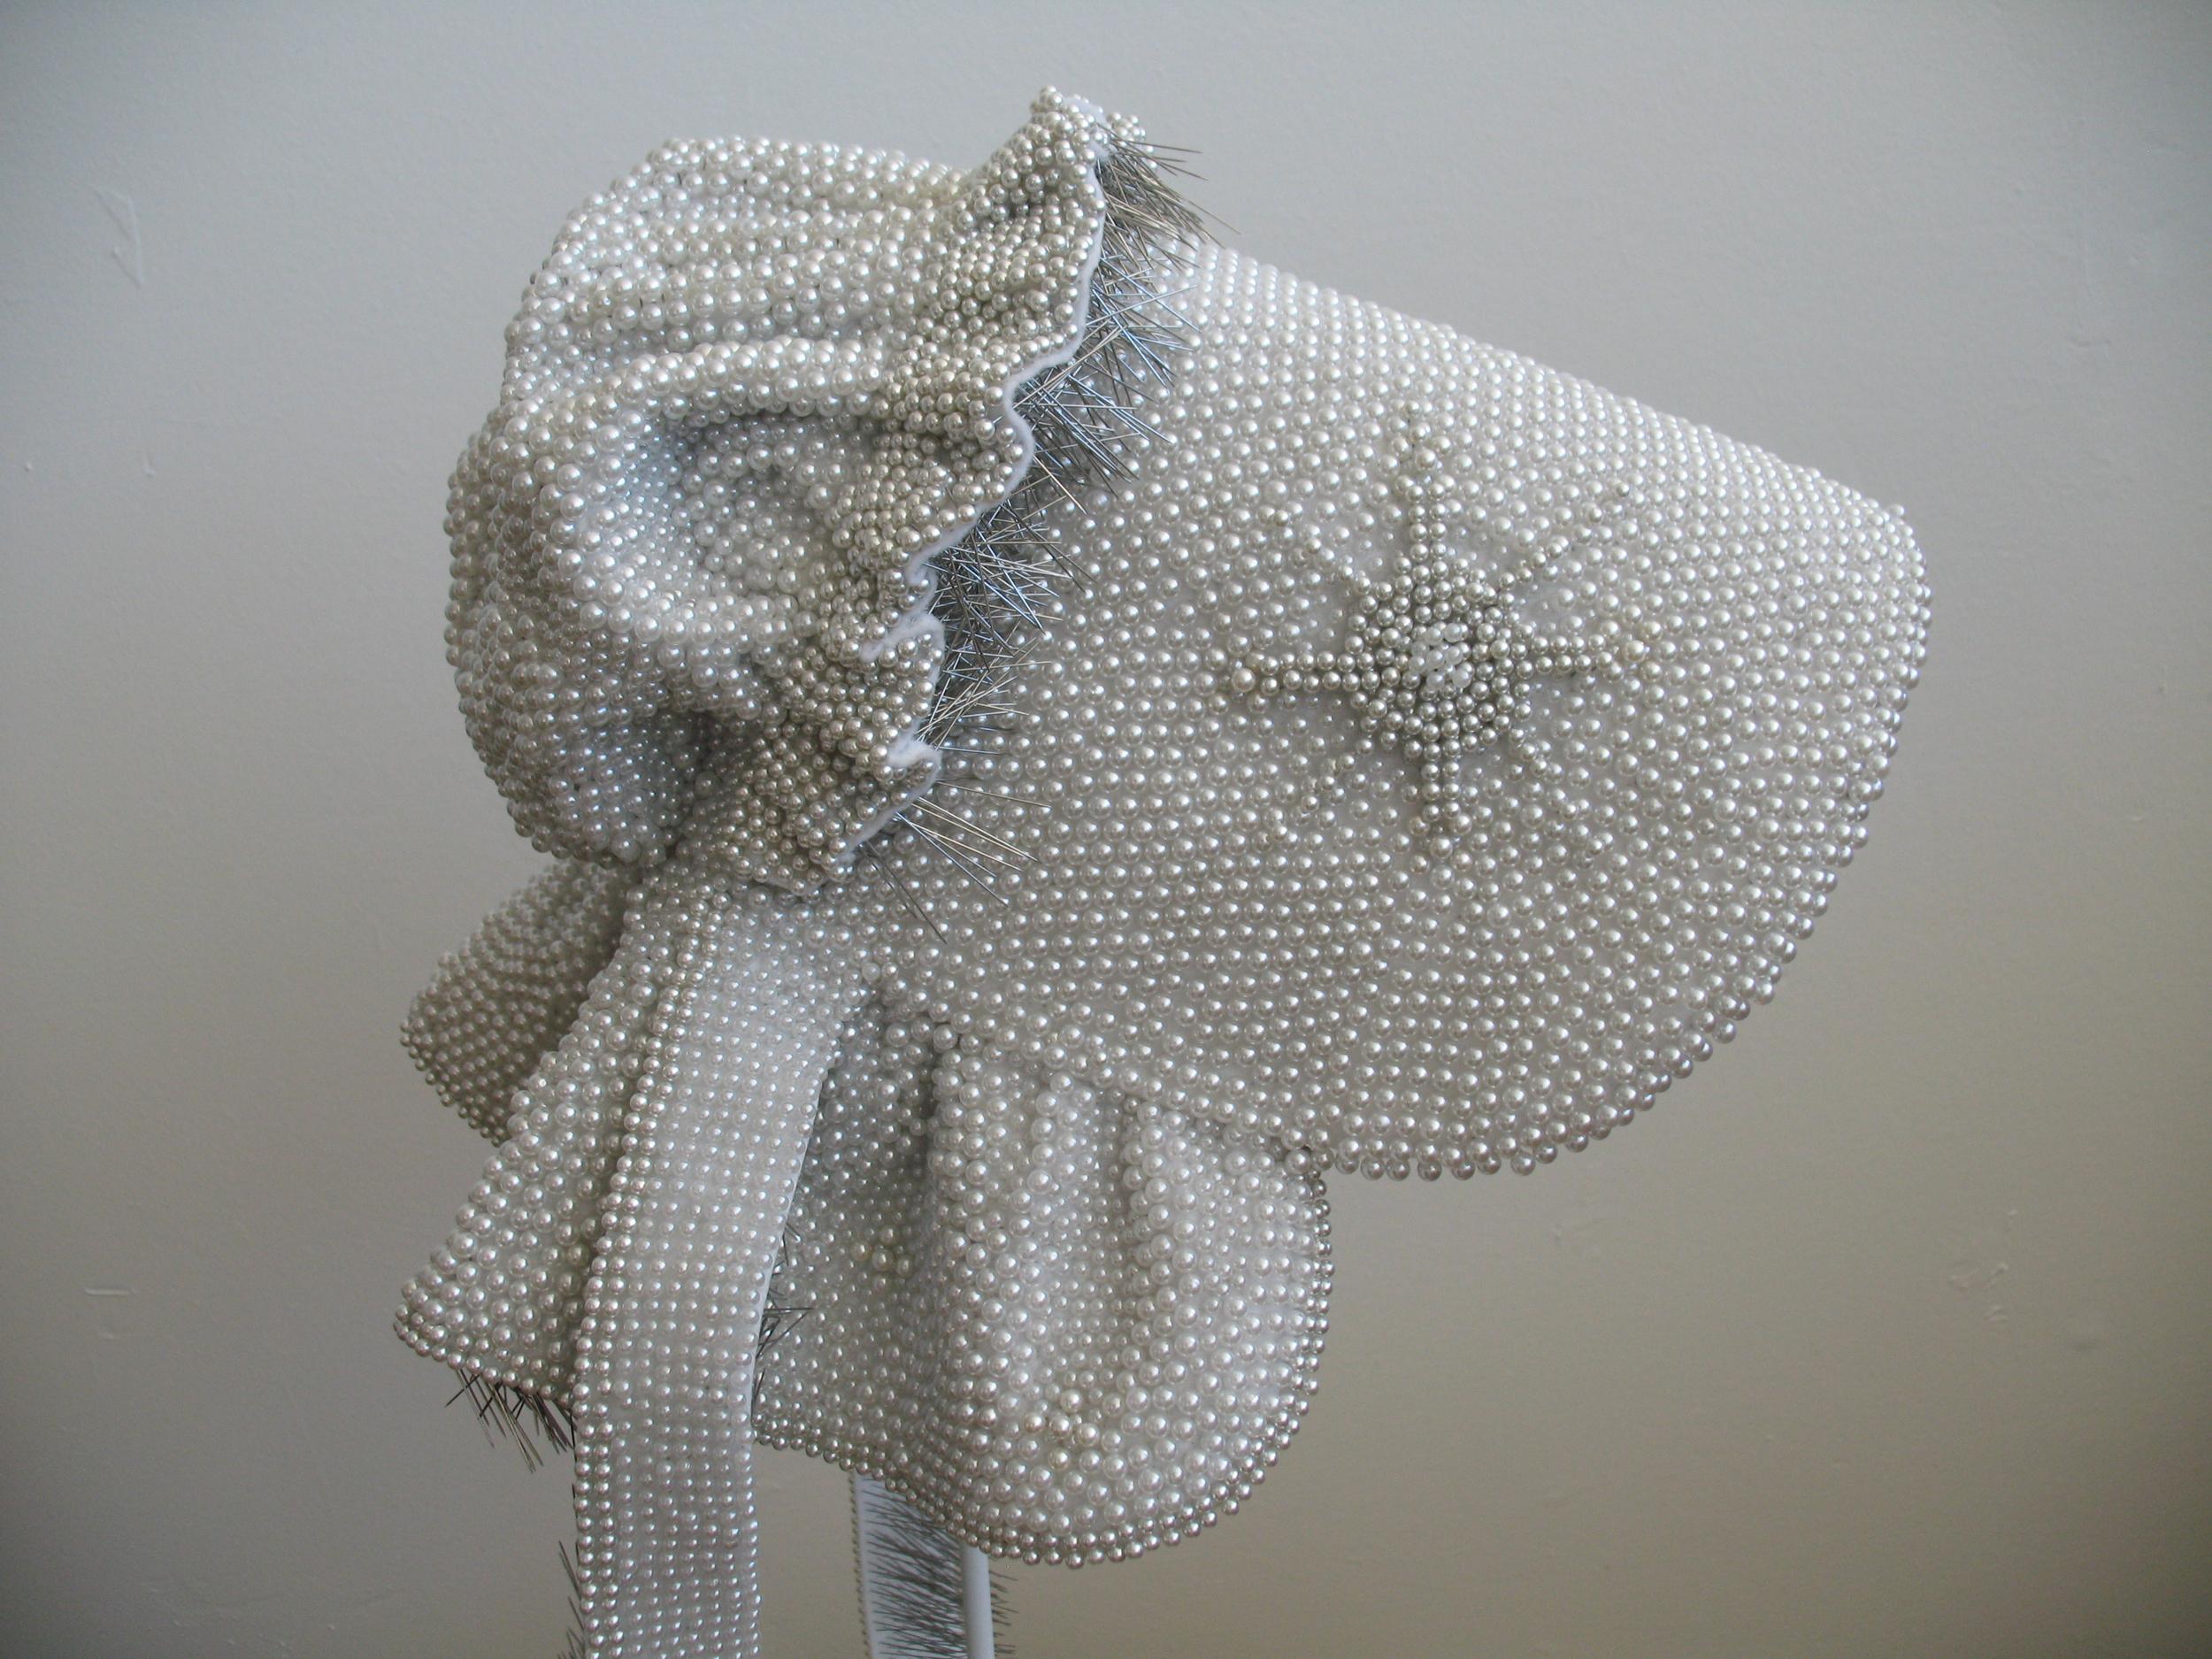 "Seer Bonnet VII  15,342 pearl corsage pins, fabric, steel, 24"" x 13"" x 16"", 2009-2010"